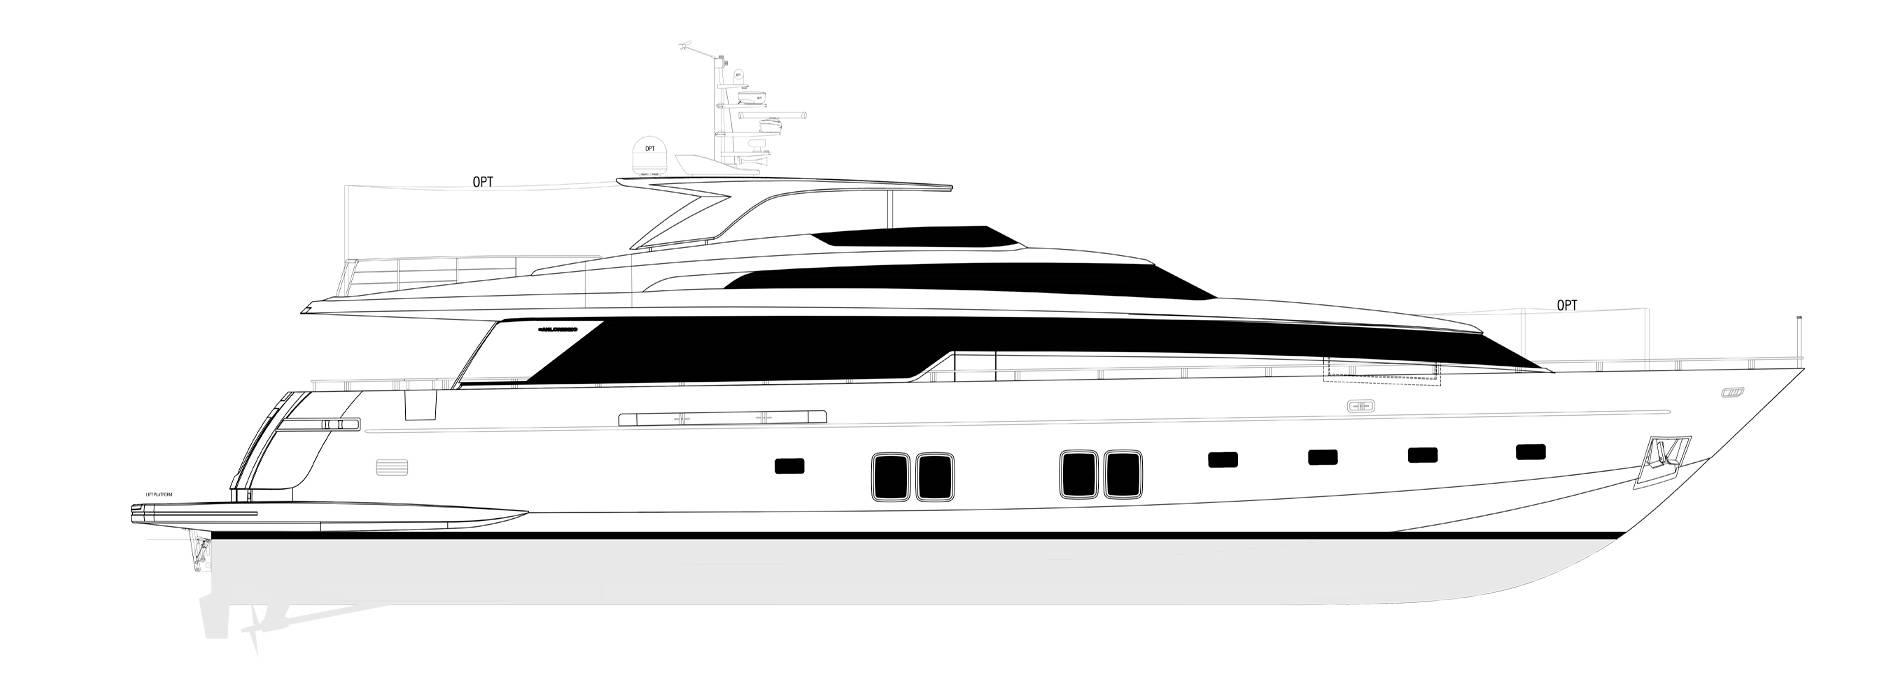 Sanlorenzo Yachts SL106-625 under offer Profil